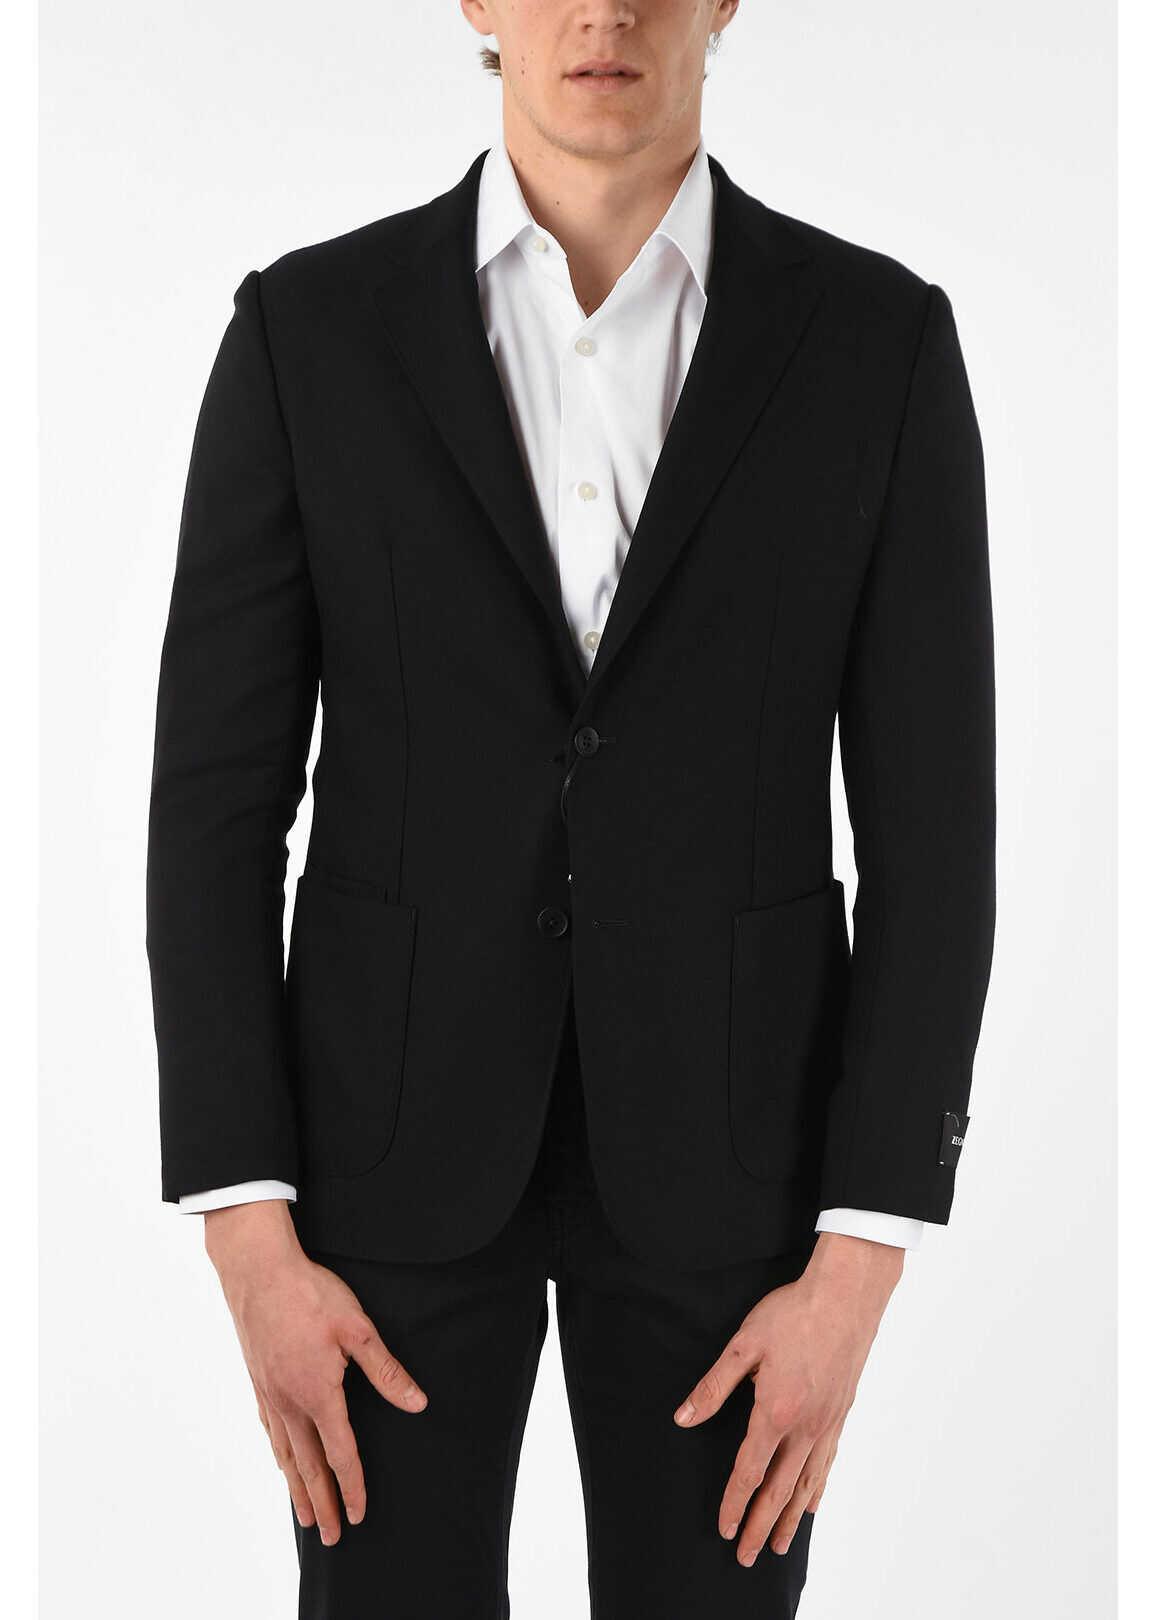 Ermenegildo Zegna ZZEGNA TECHMERINO Wool 2 Button Blazer with Notch Lapel BLACK imagine